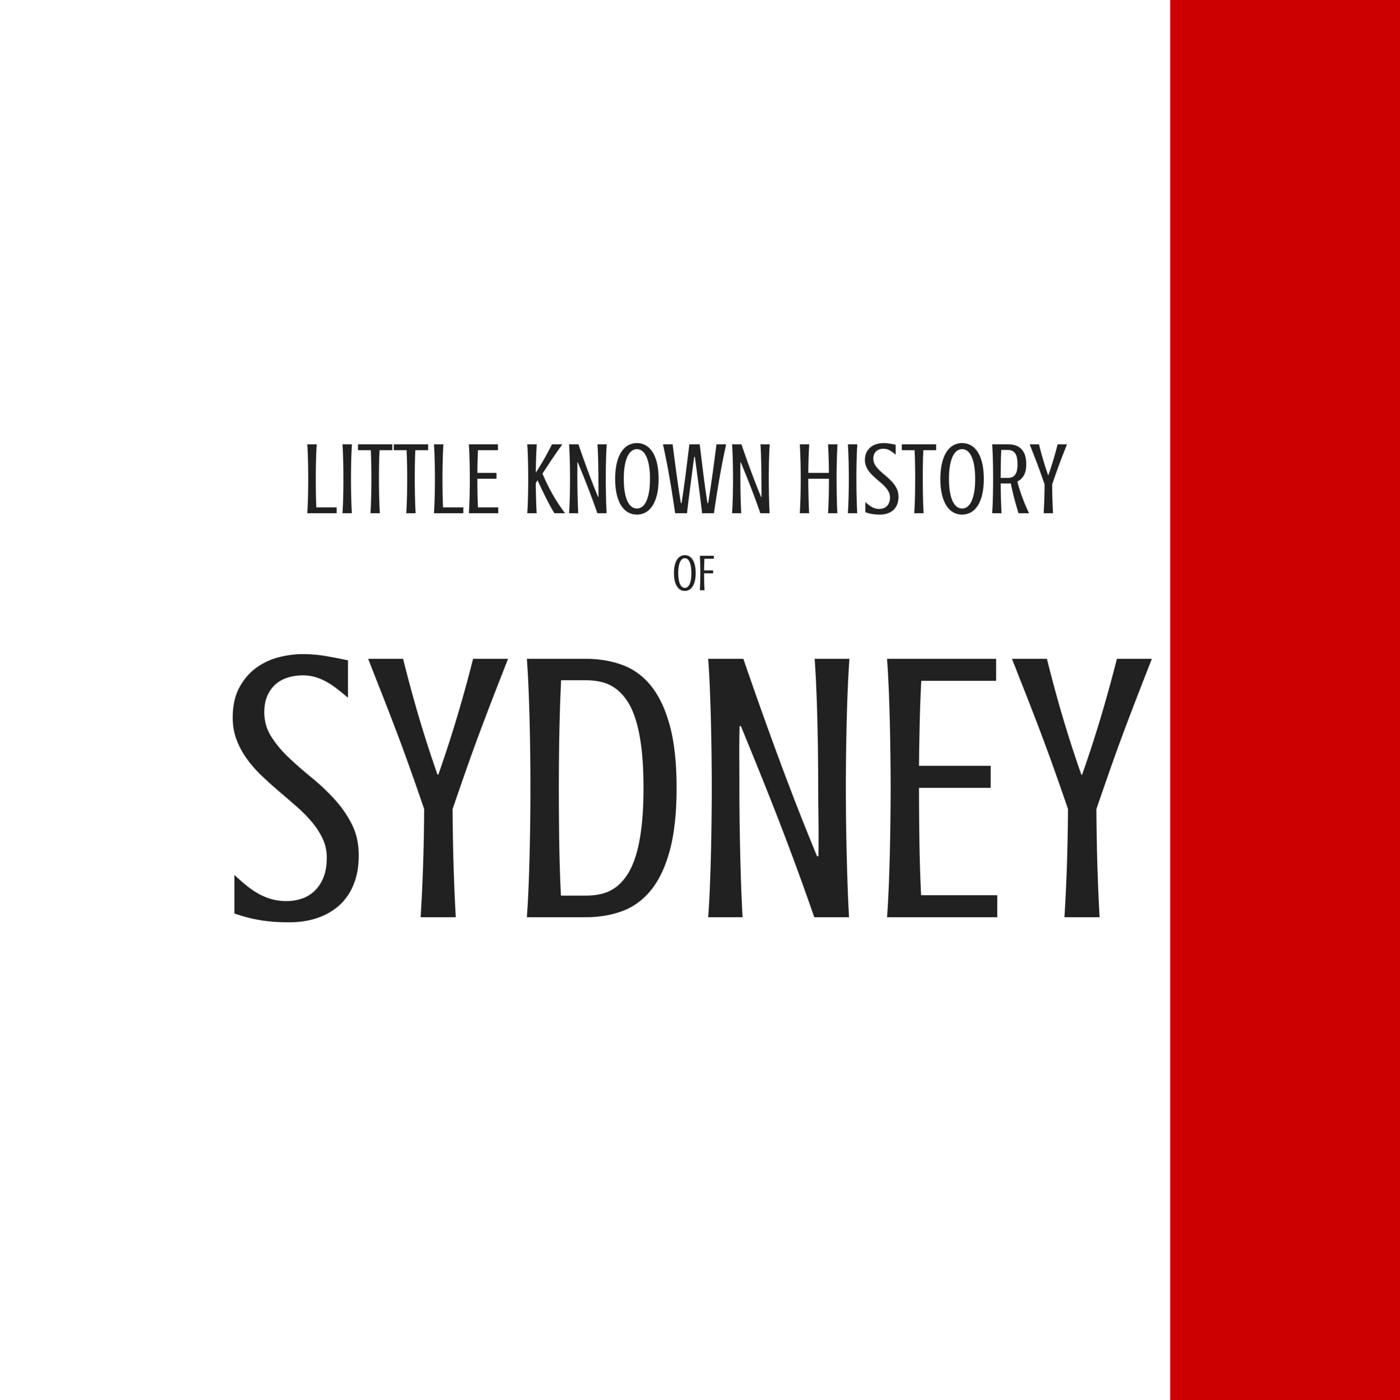 History of Sydney